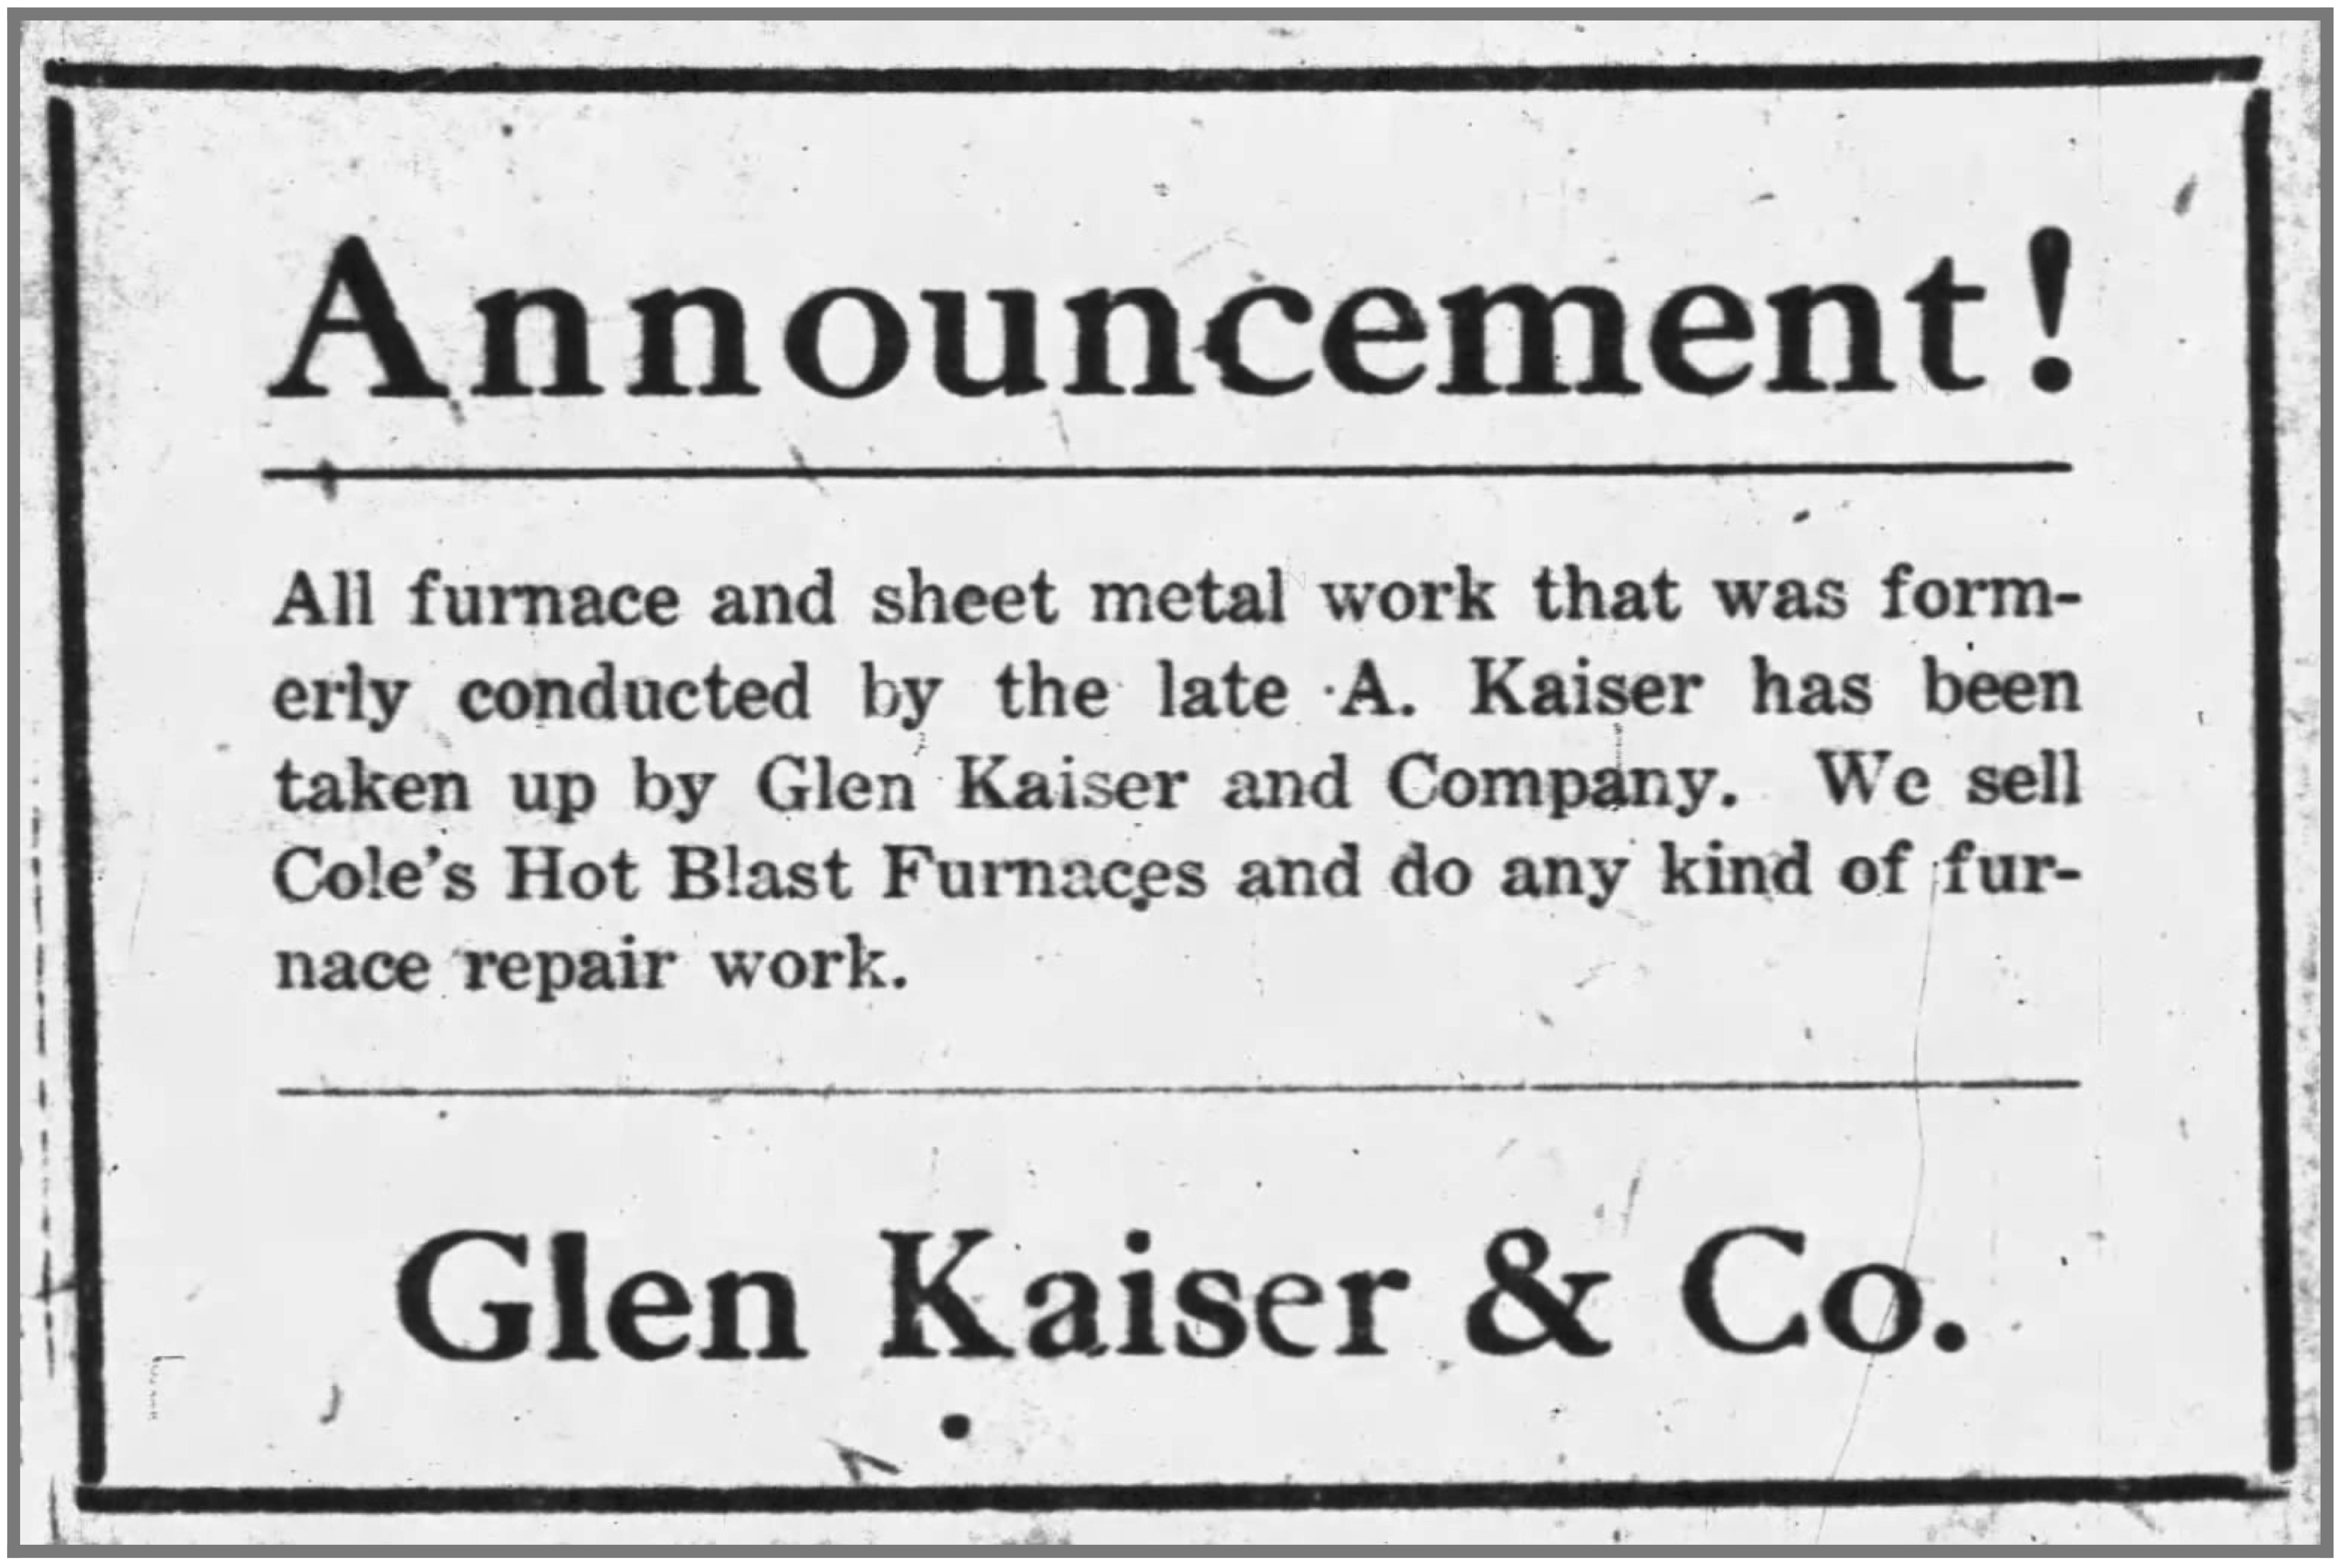 Kaiser_Glenn_1923_MetalCompany_DekDailyChron_25Oct